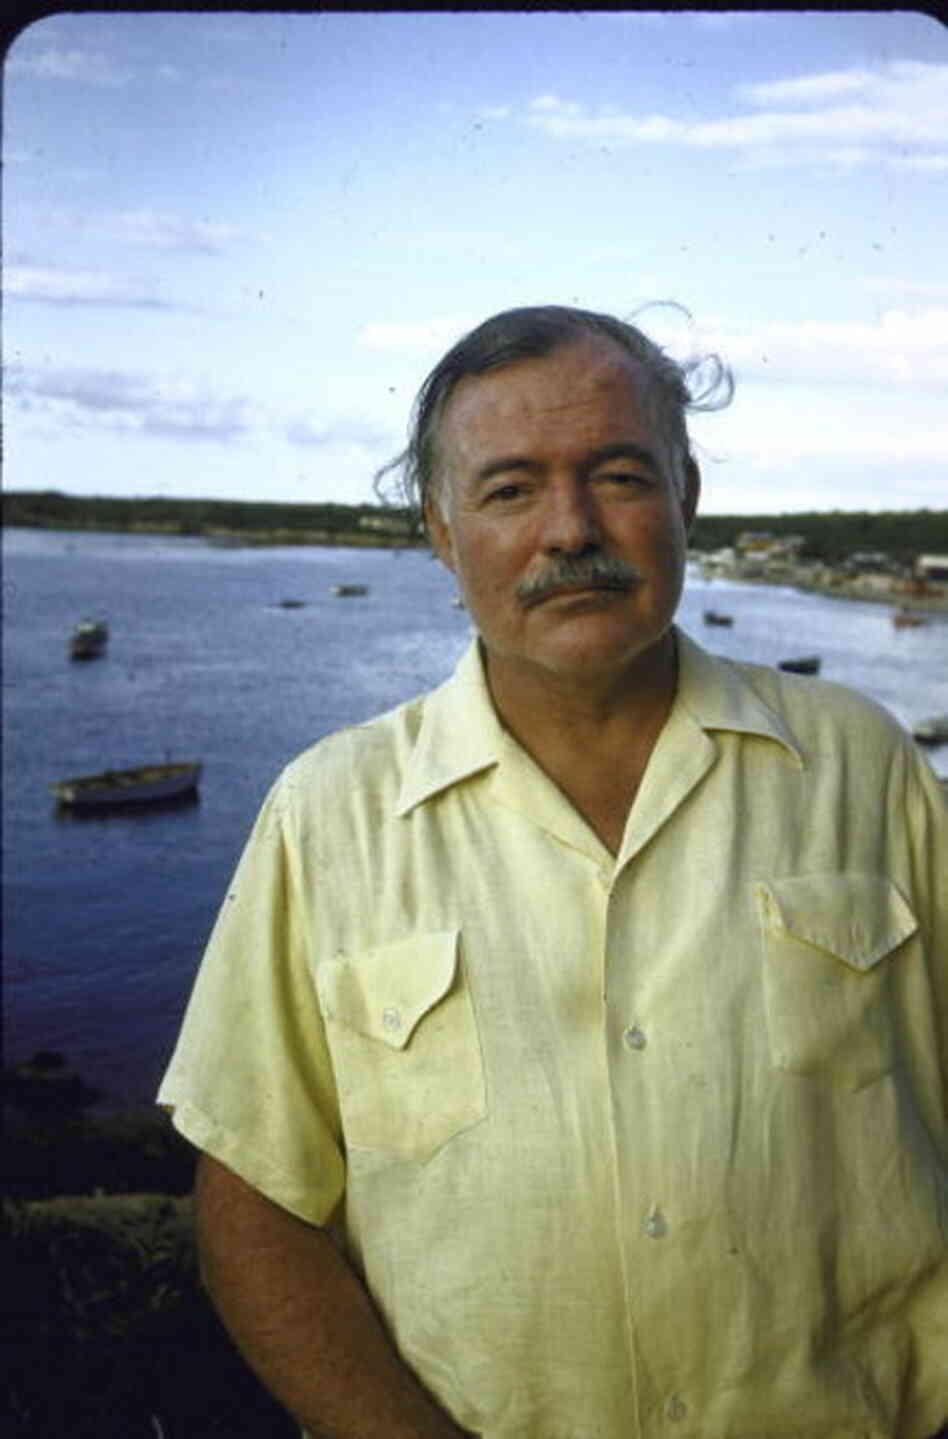 Ernest Hemingway at a Cuban fishing village